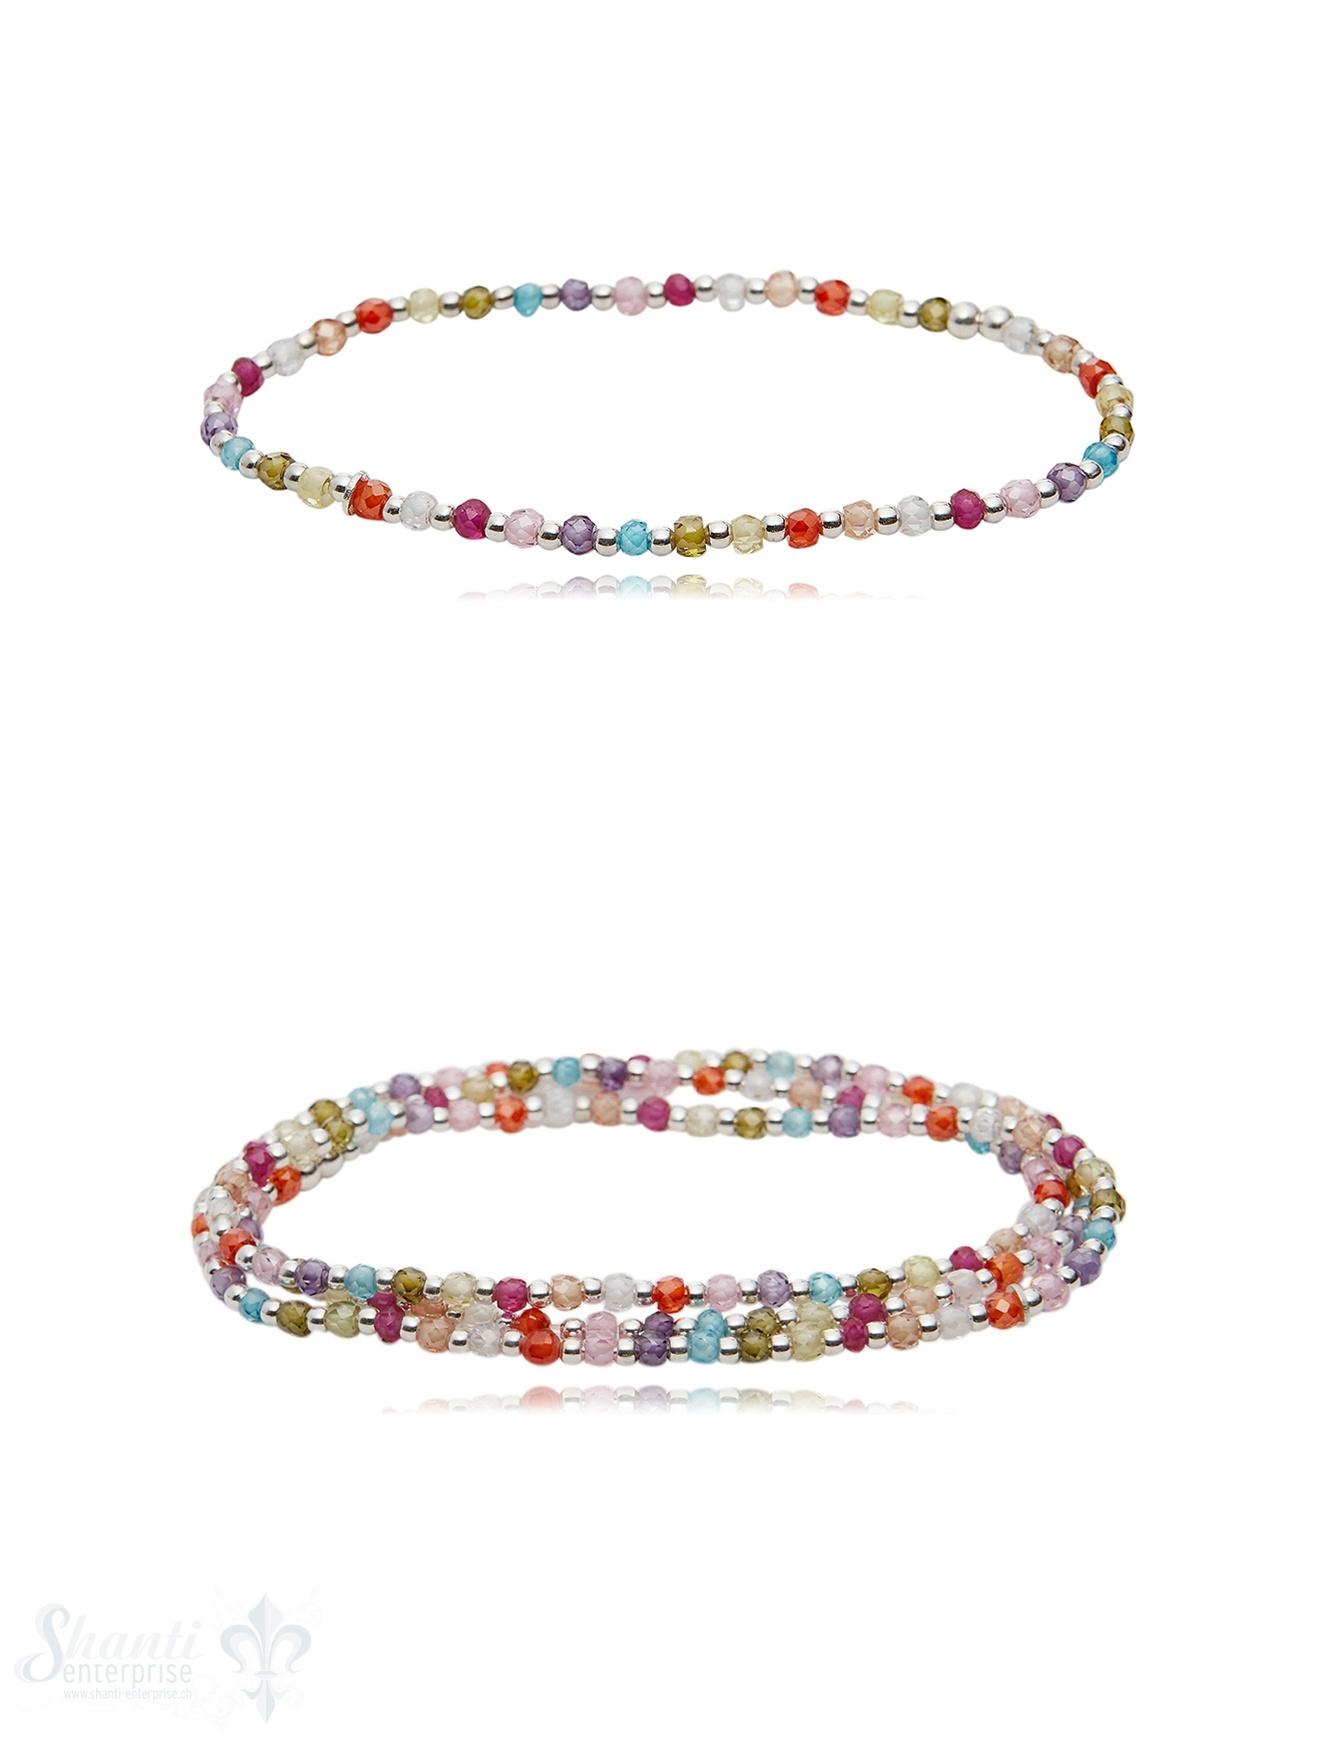 Zirkon Armband multicolor mit Silber auf Elast